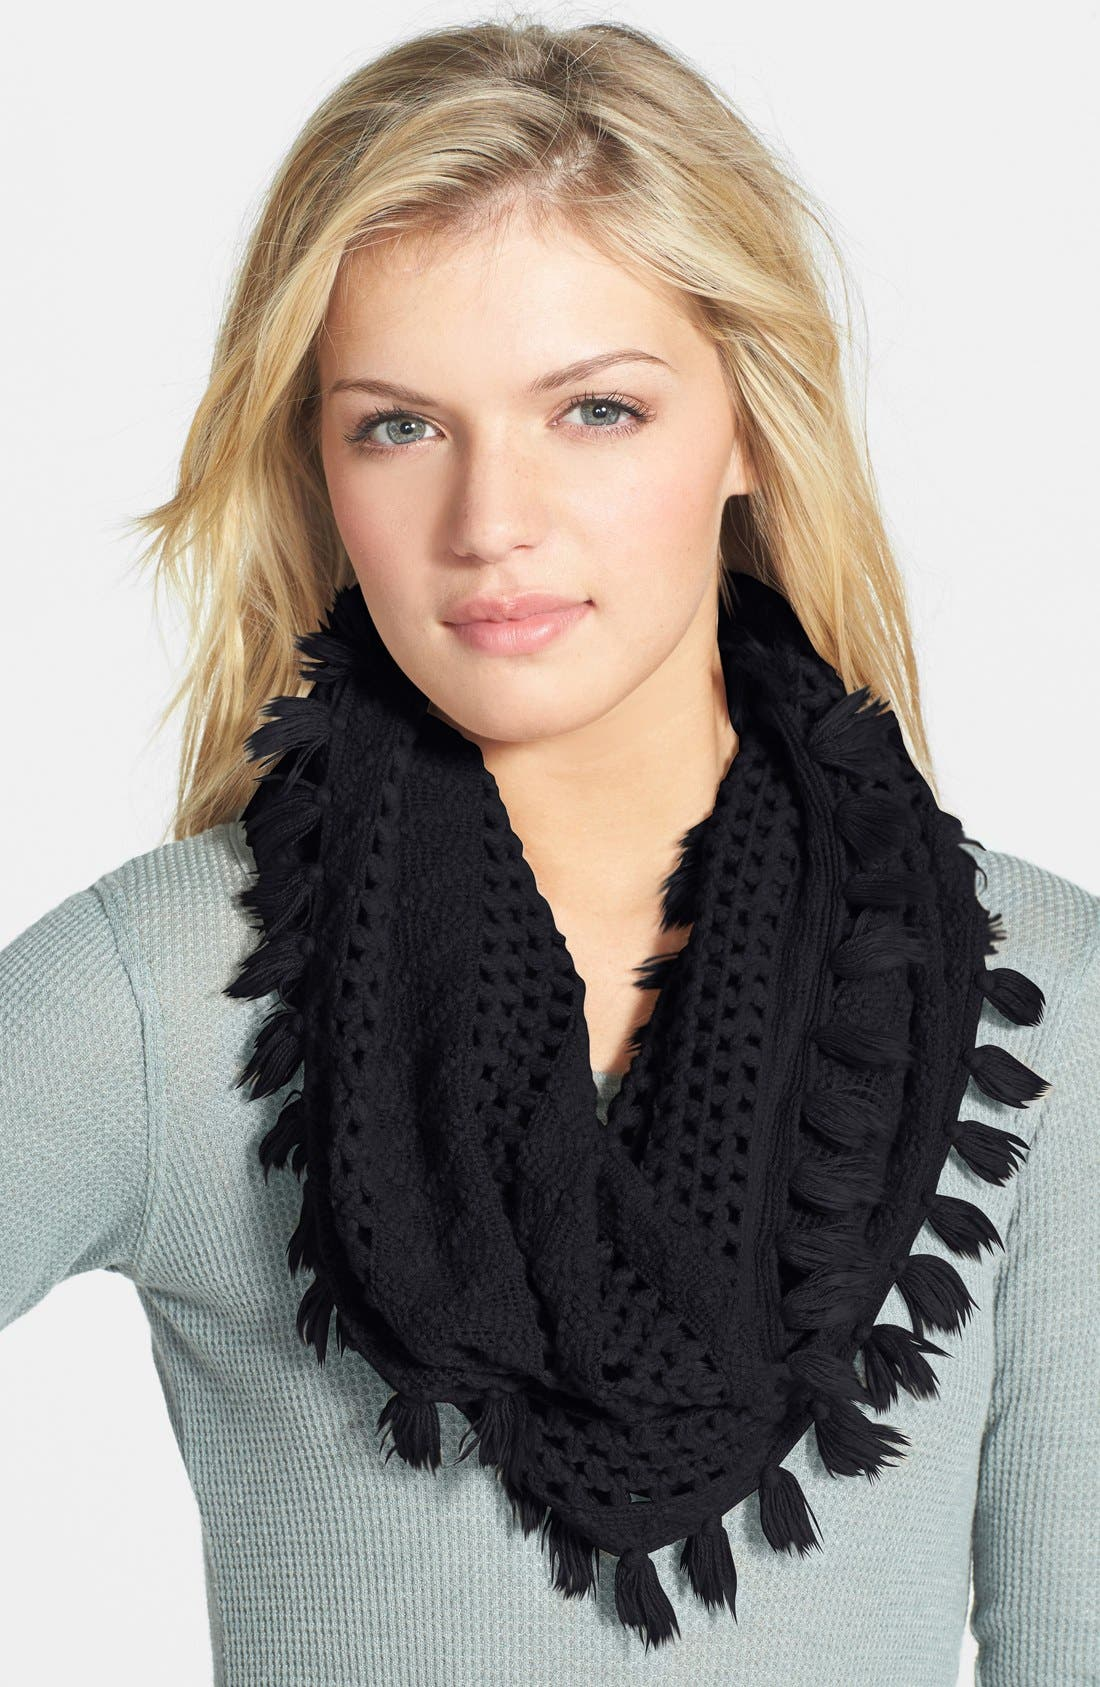 Alternate Image 1 Selected - BP. Tassel Open Knit Infinity Scarf (Juniors)